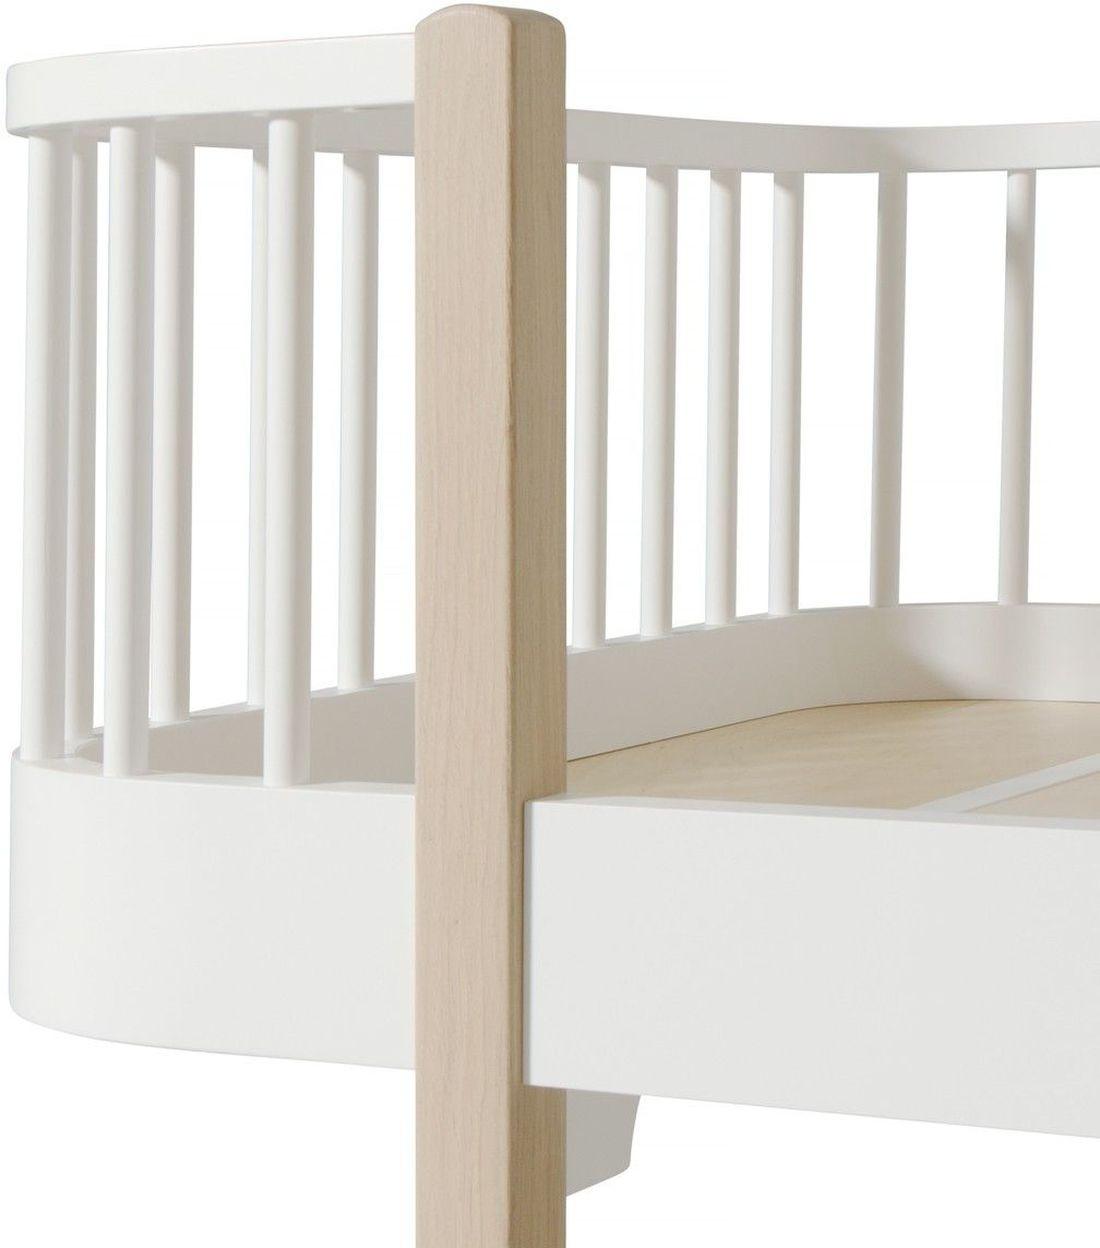 Bettsofa tagesbett wood 90x200 cm oliver furniture for Bettsofa 200 cm